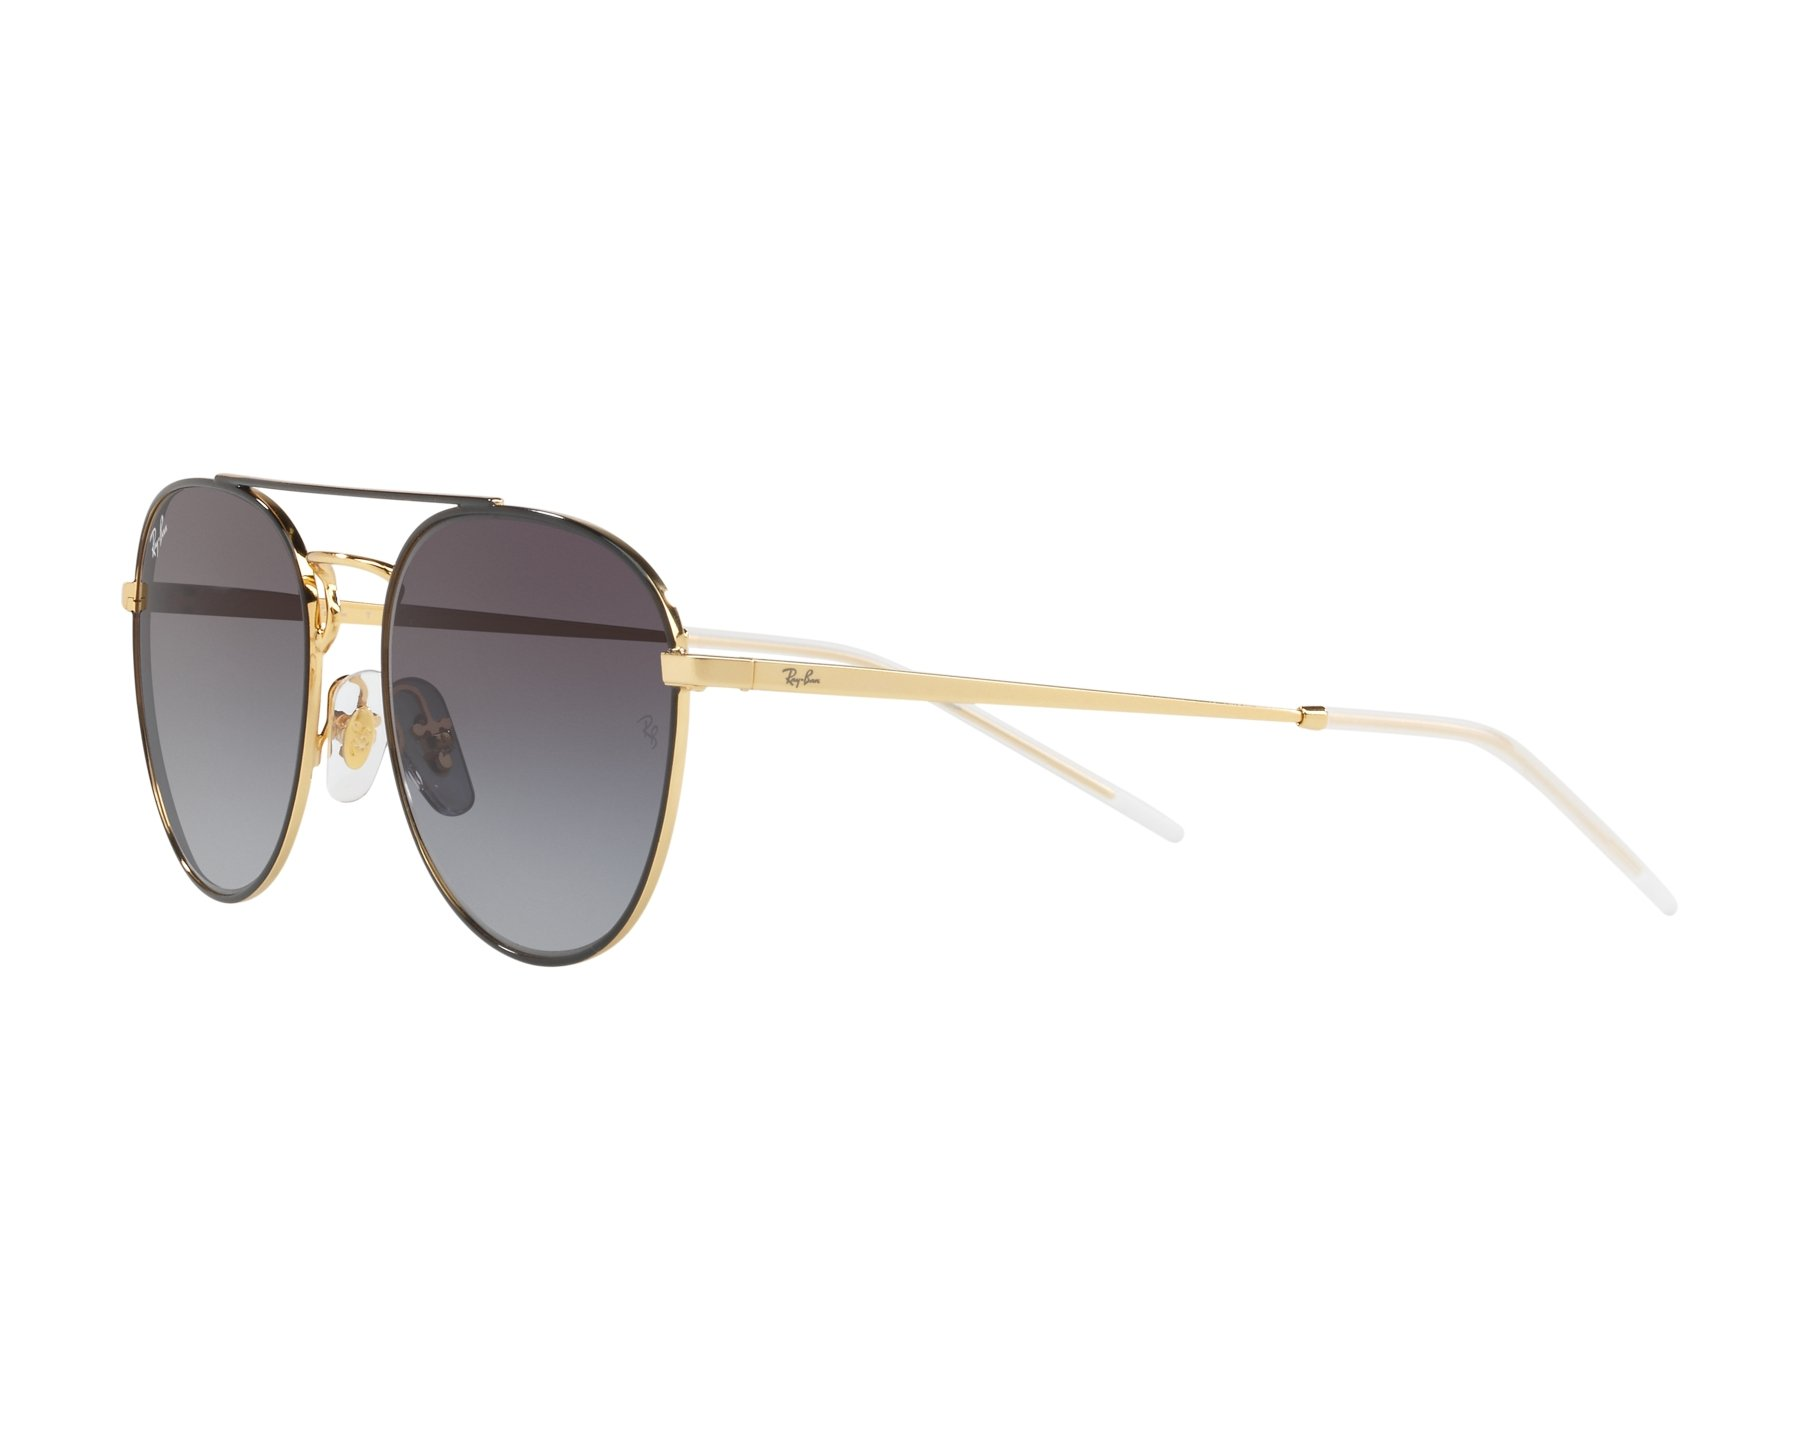 00374c7e59 Sunglasses Ray-Ban RB-3589 90548G 55-18 Black Gold 360 degree view